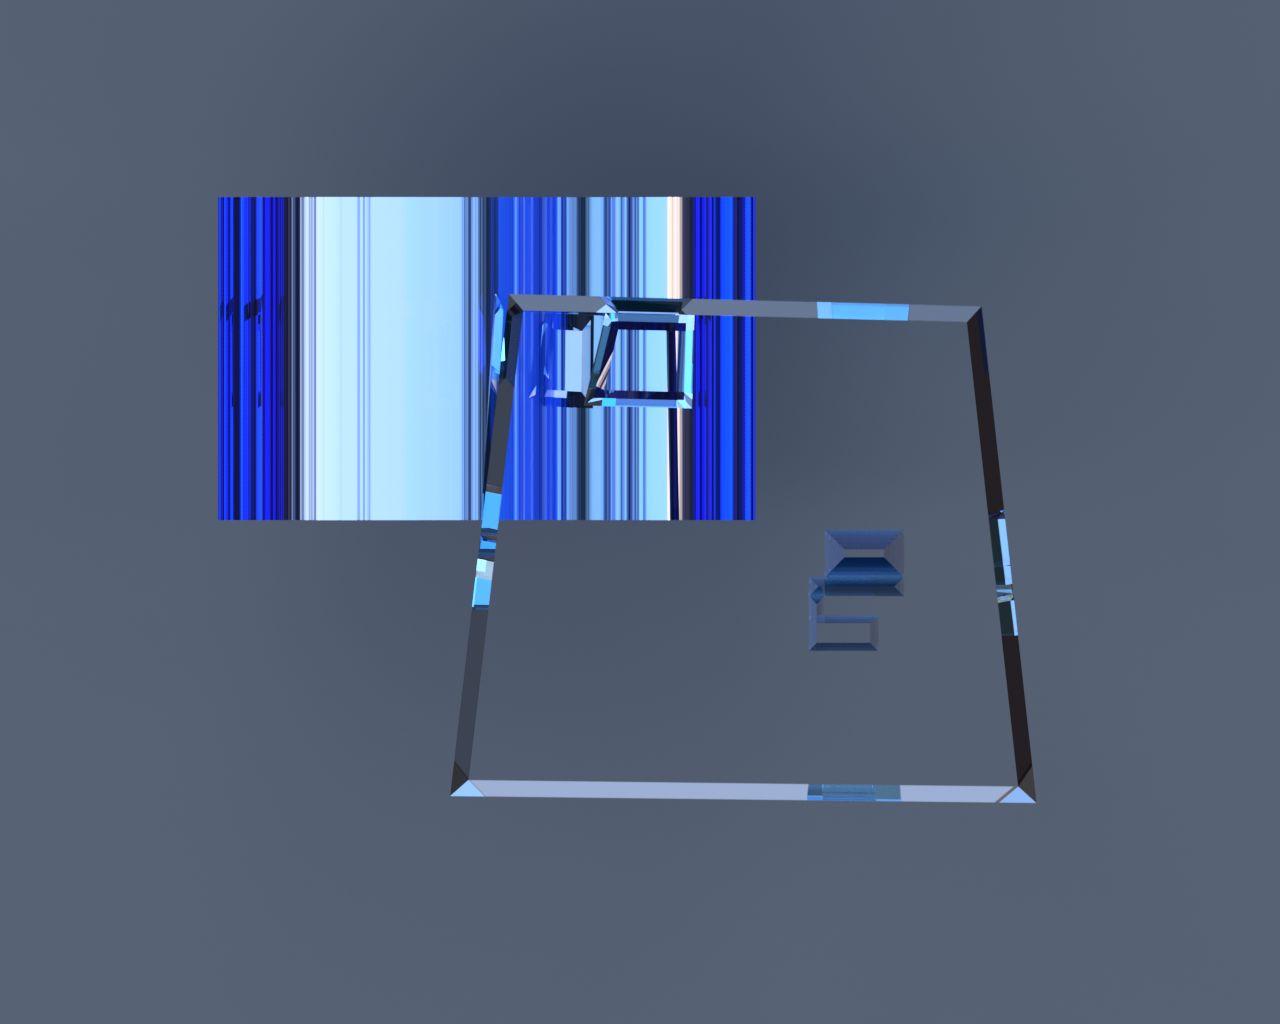 Raasrendering-e4a02b9b-7bd4-42a1-80bf-afd41f7831a2-3500-3500